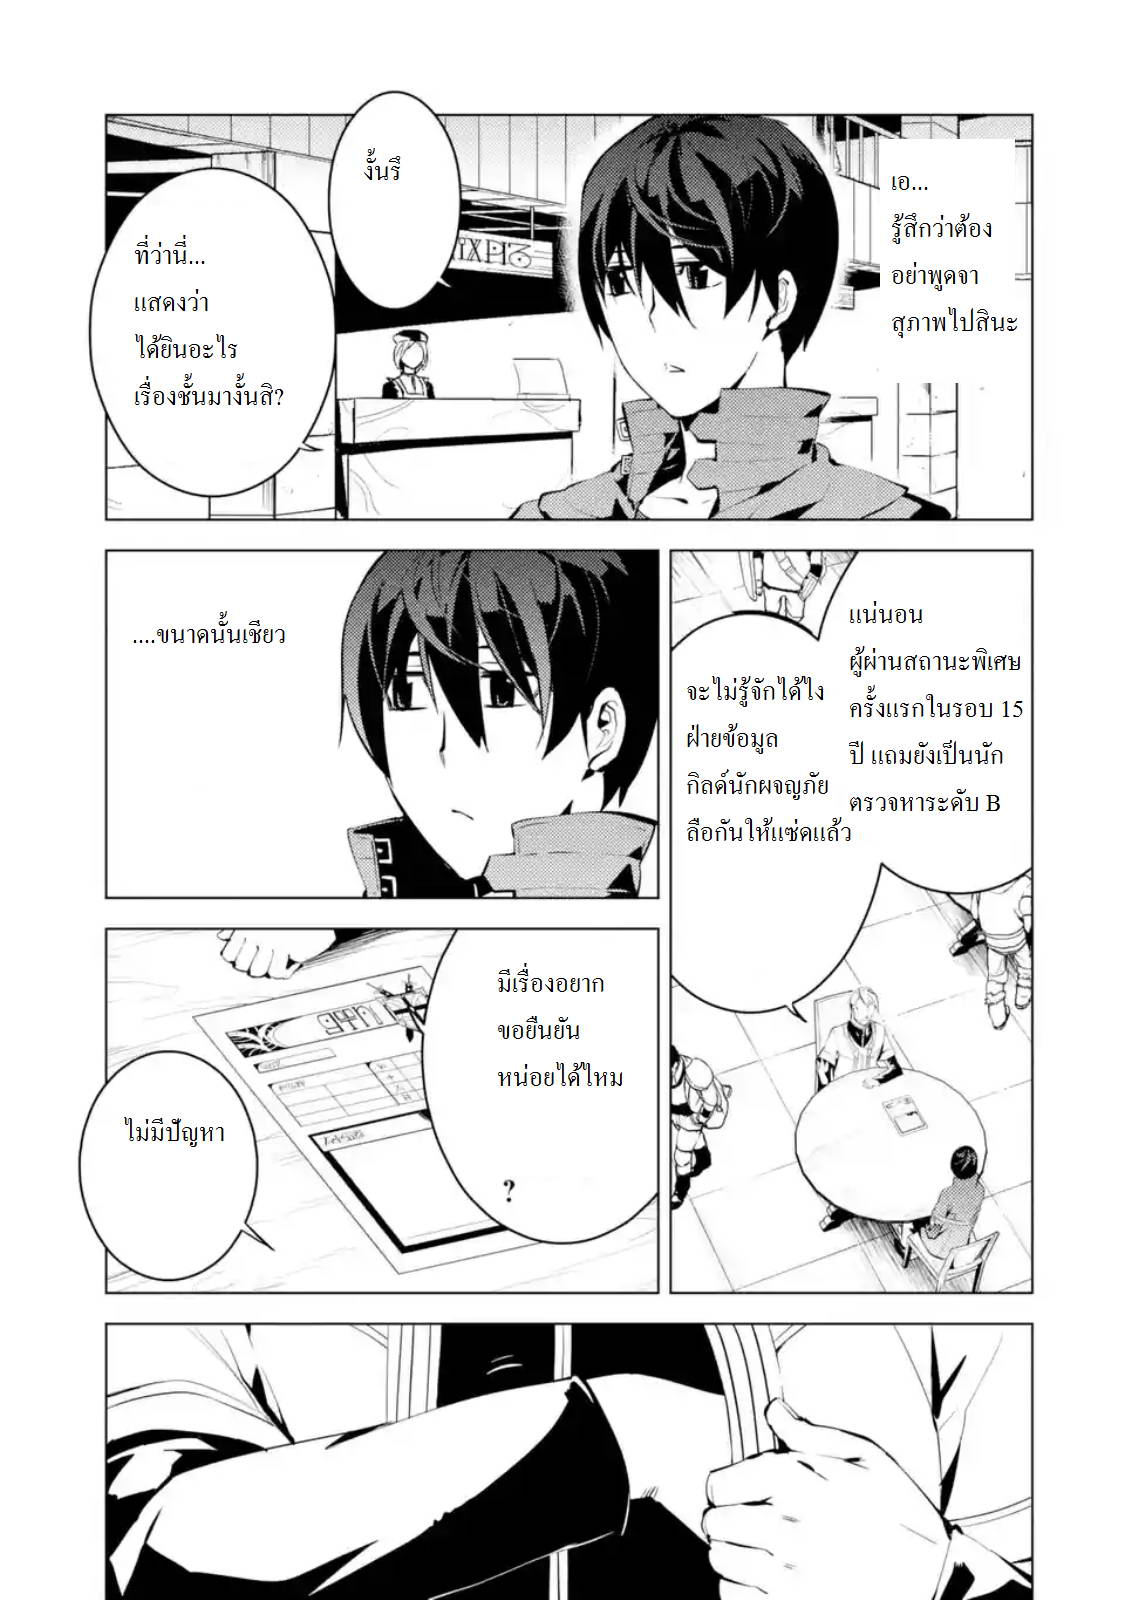 Tensei Kenja no Isekai Life ตอนที่ 4.3 TH แปลไทย